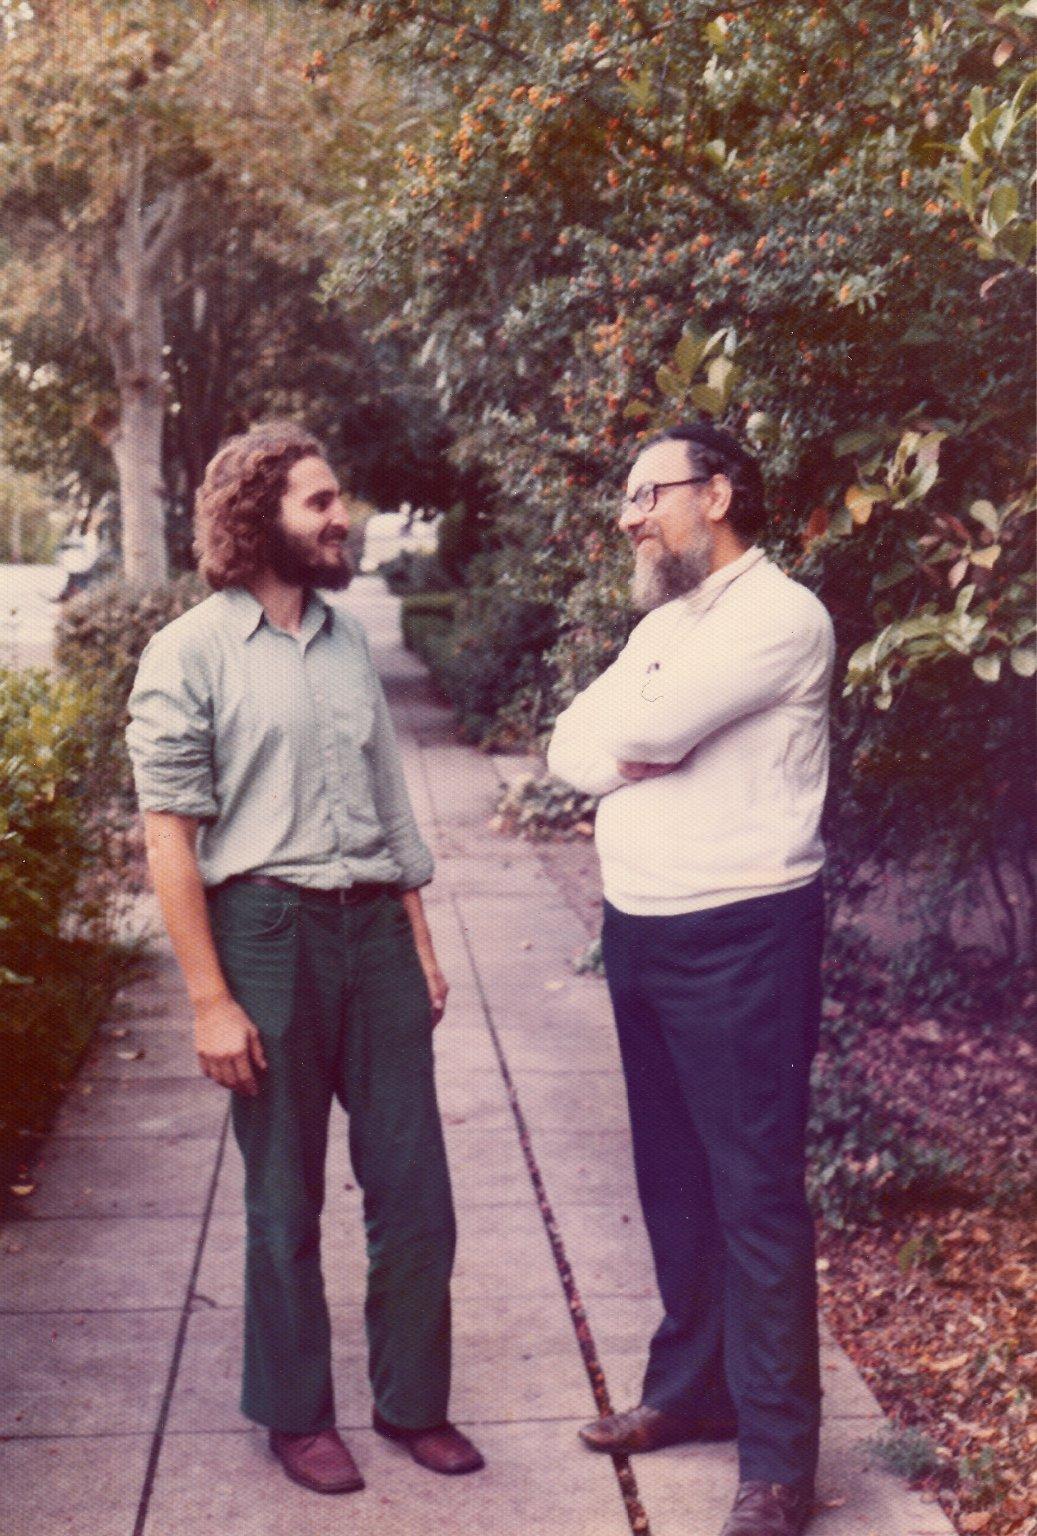 Rabbi Zalman Schachter in conversation with a student, ca. 1972.